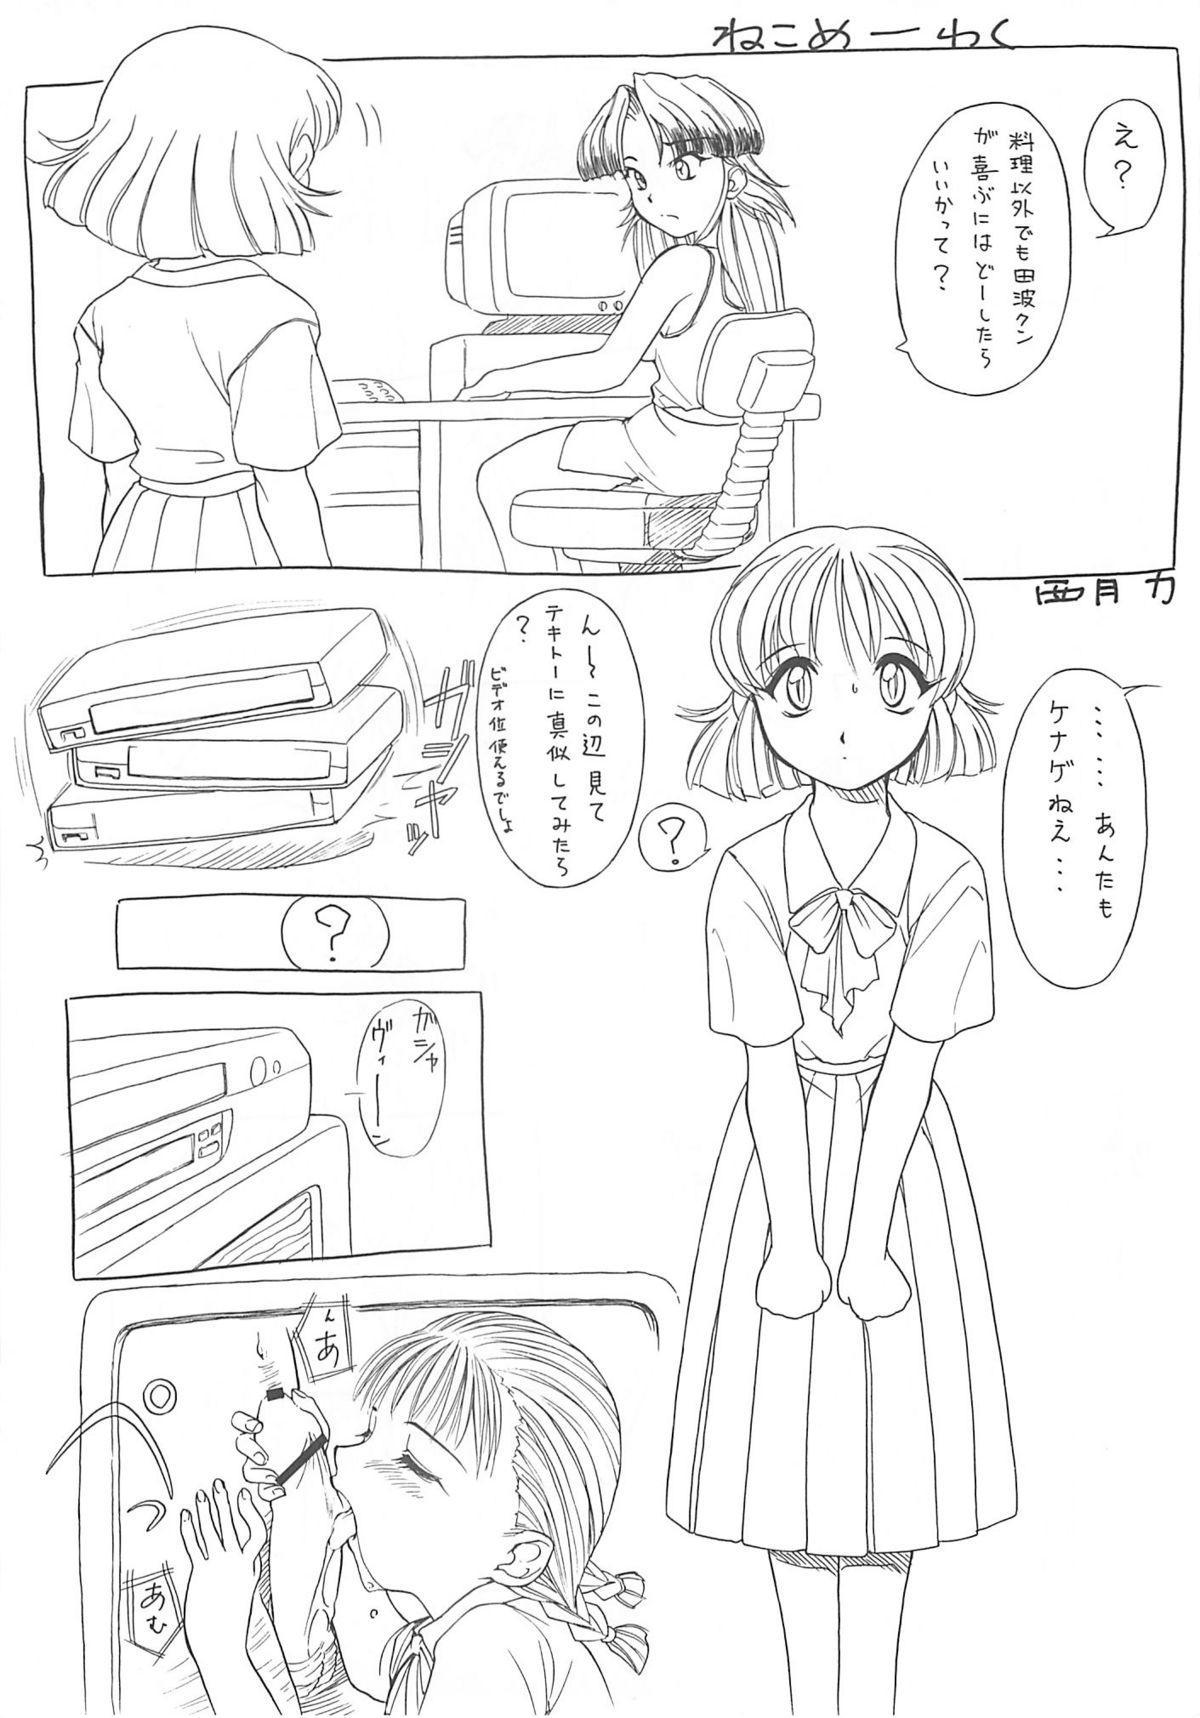 Nishitsuki Recycle 21